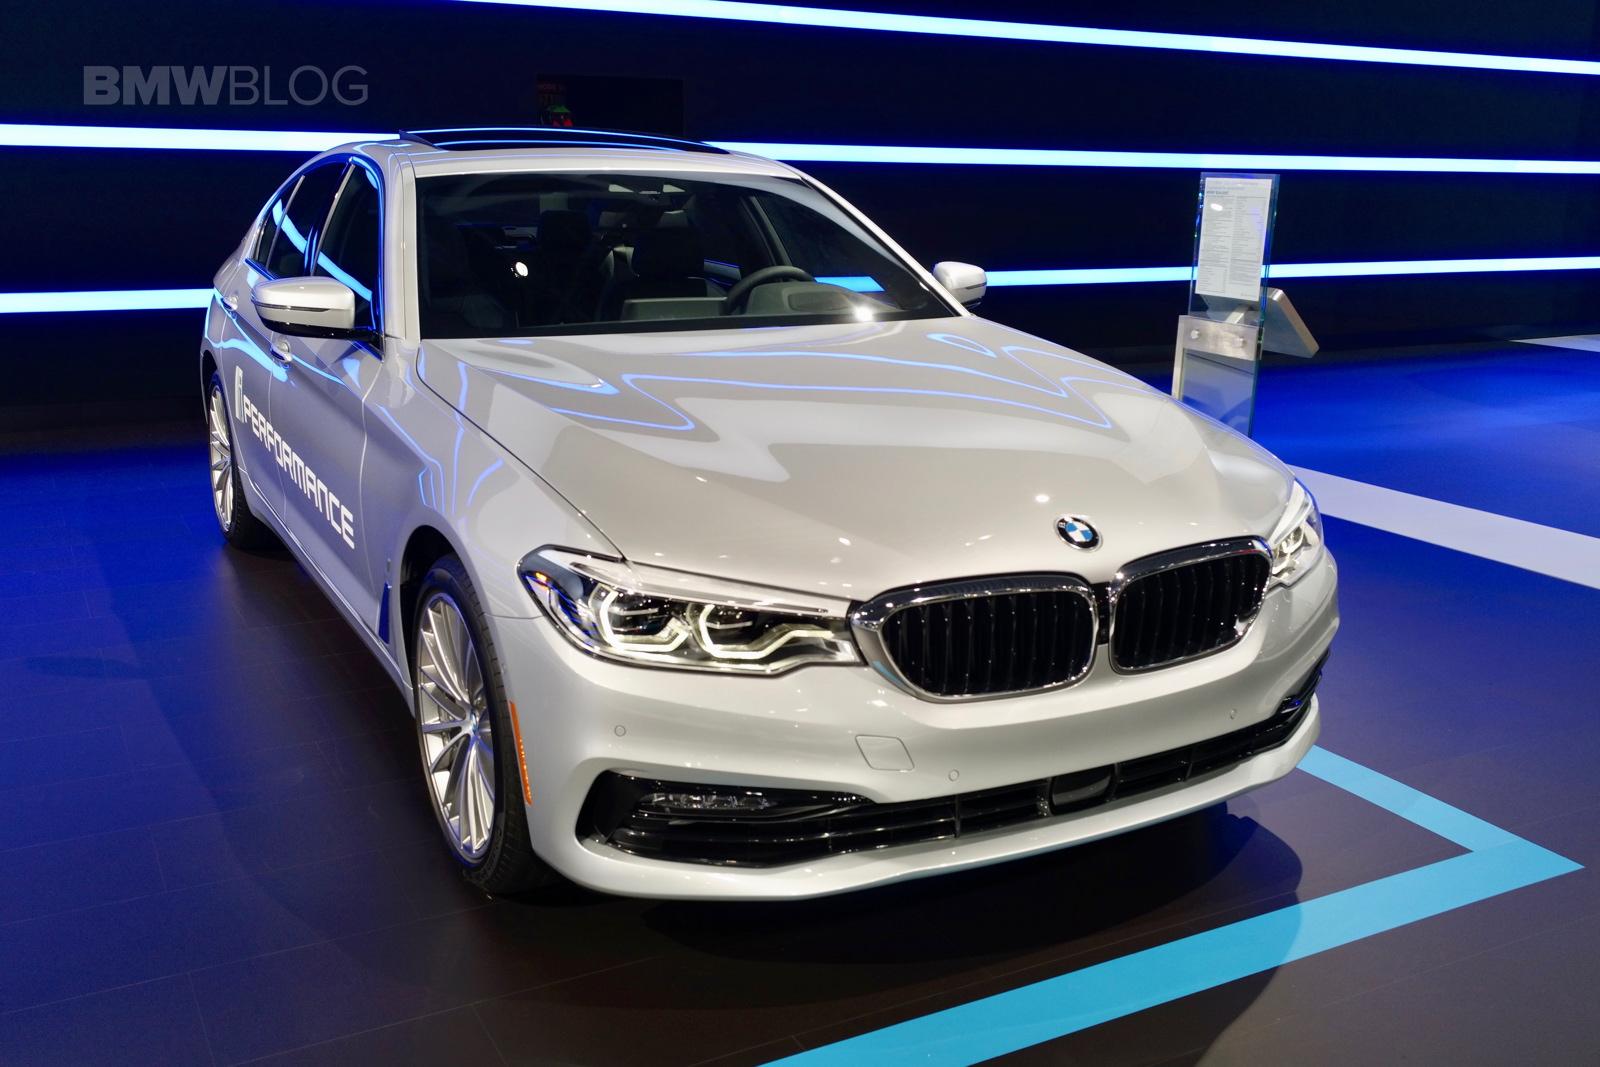 2017 BMW 530e nyc 03